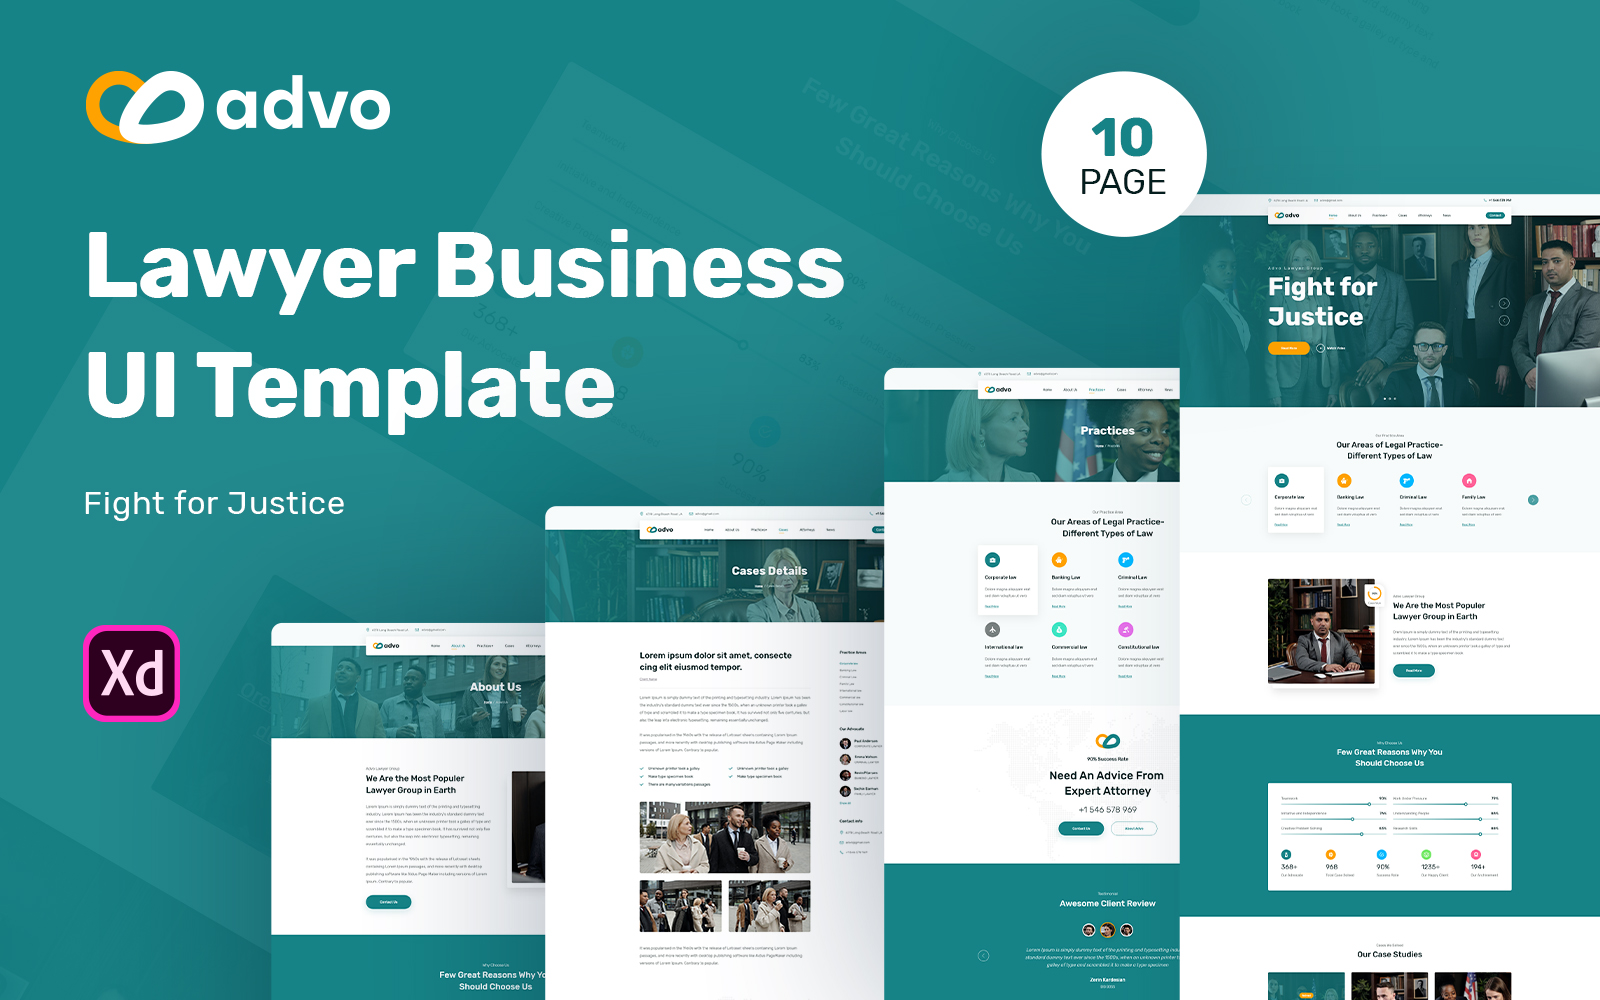 Advo - Lawyer Business Website UI Elements